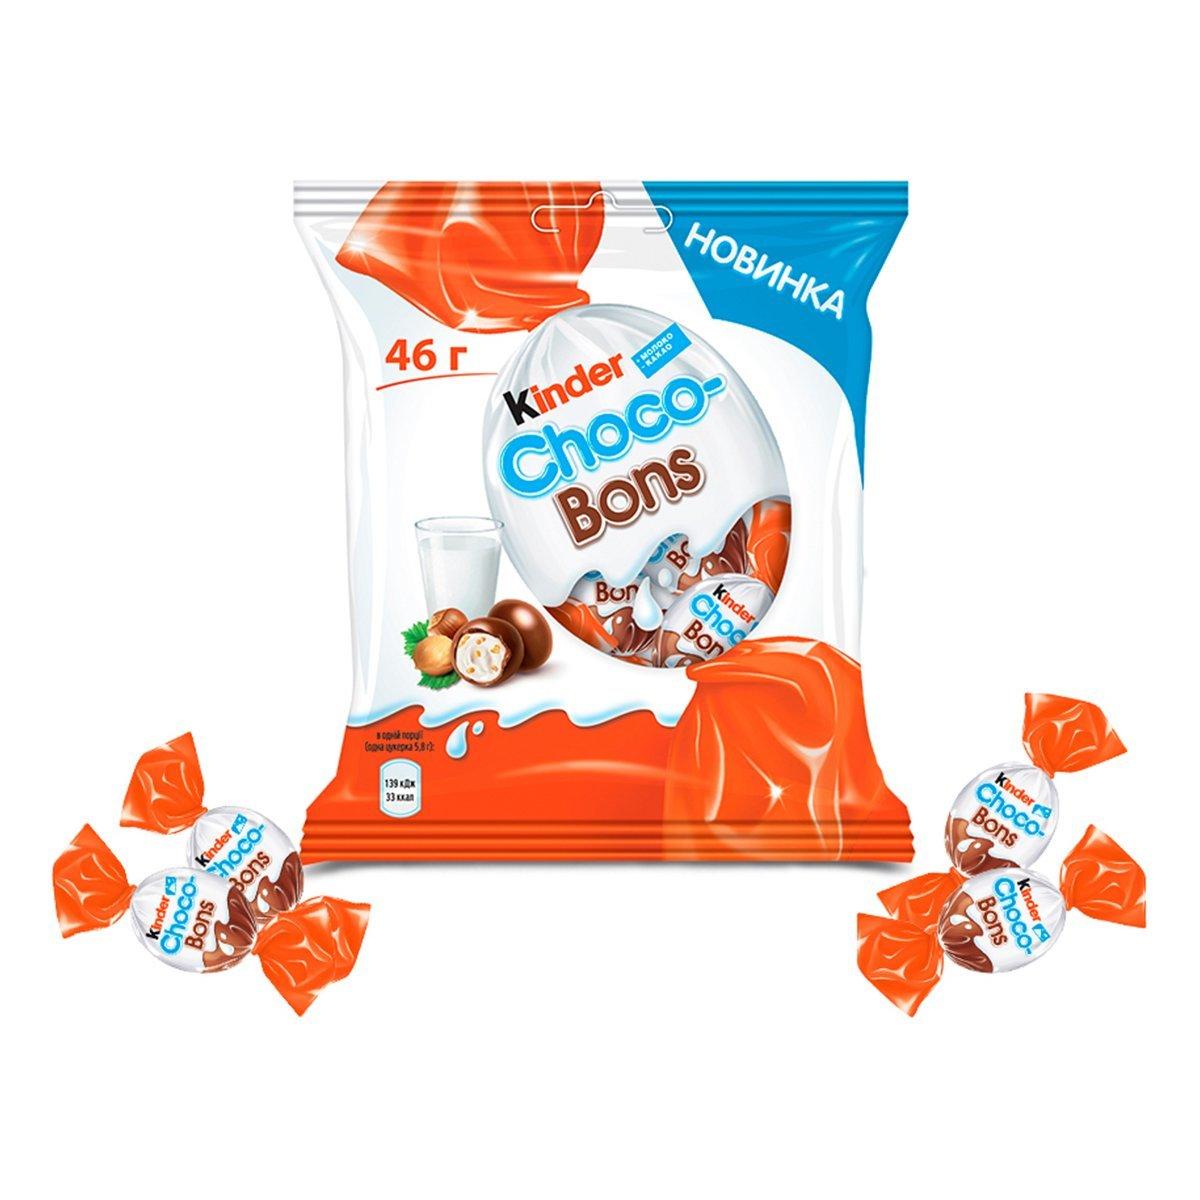 Конфеты Kinder Choco-Bons из молочного шоколада с молочно-ореховой начинкой 46 г G46x12 ТМ: Kinder